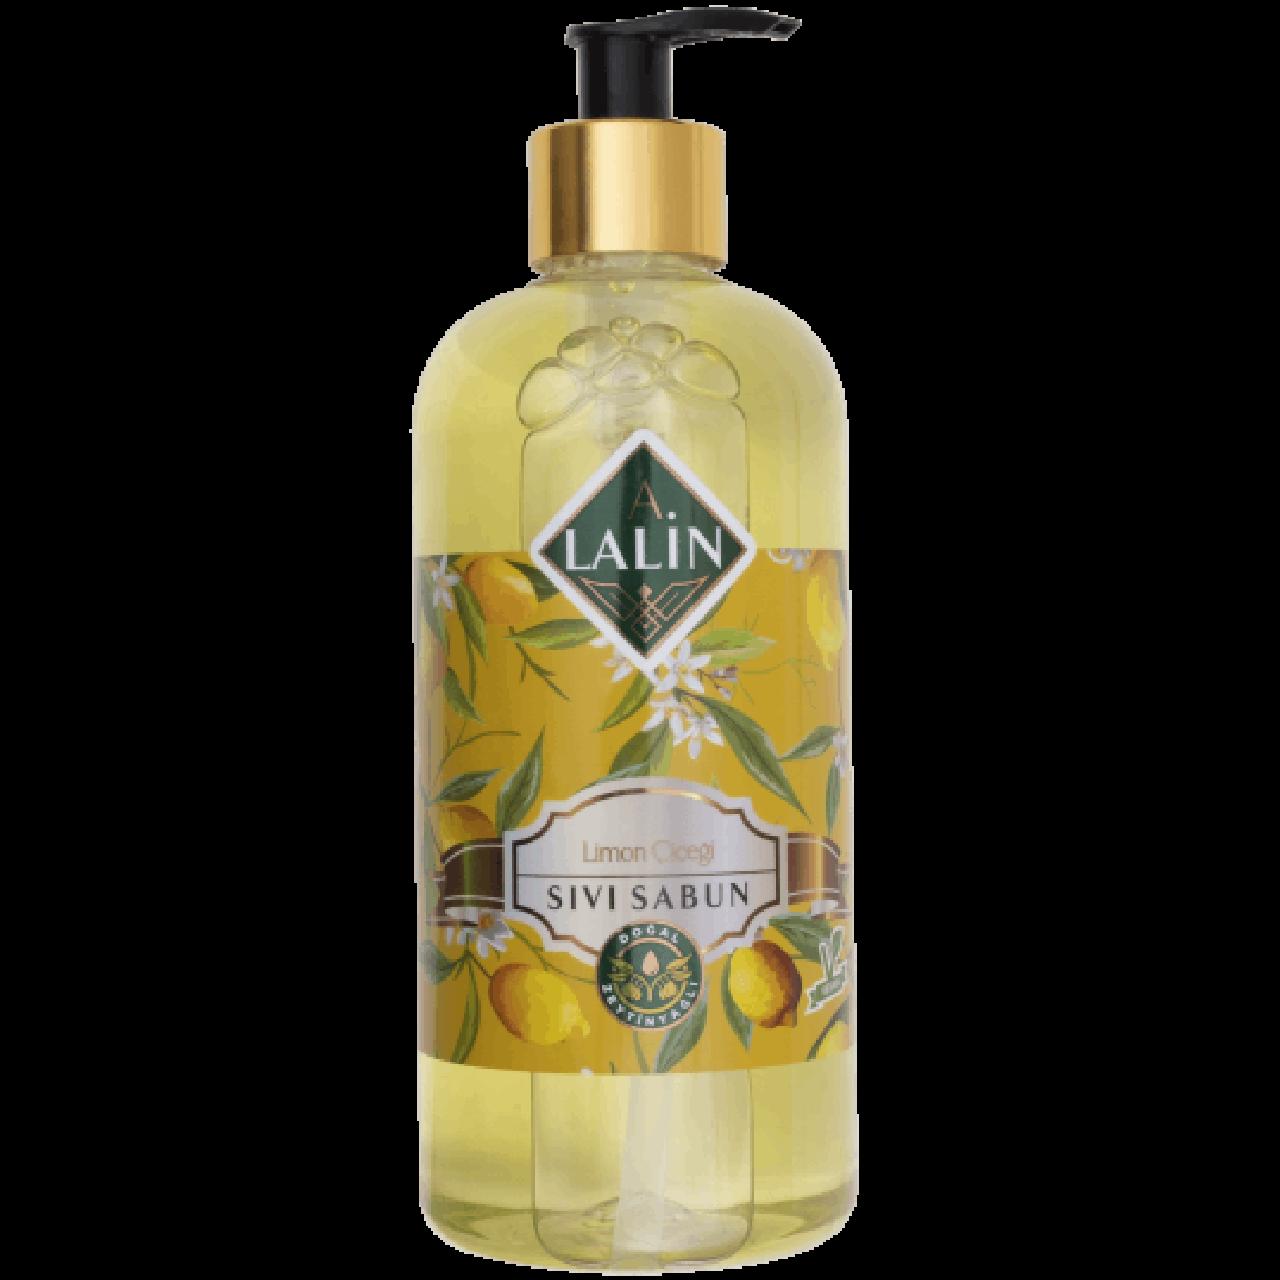 limon_cicegi_alalin3